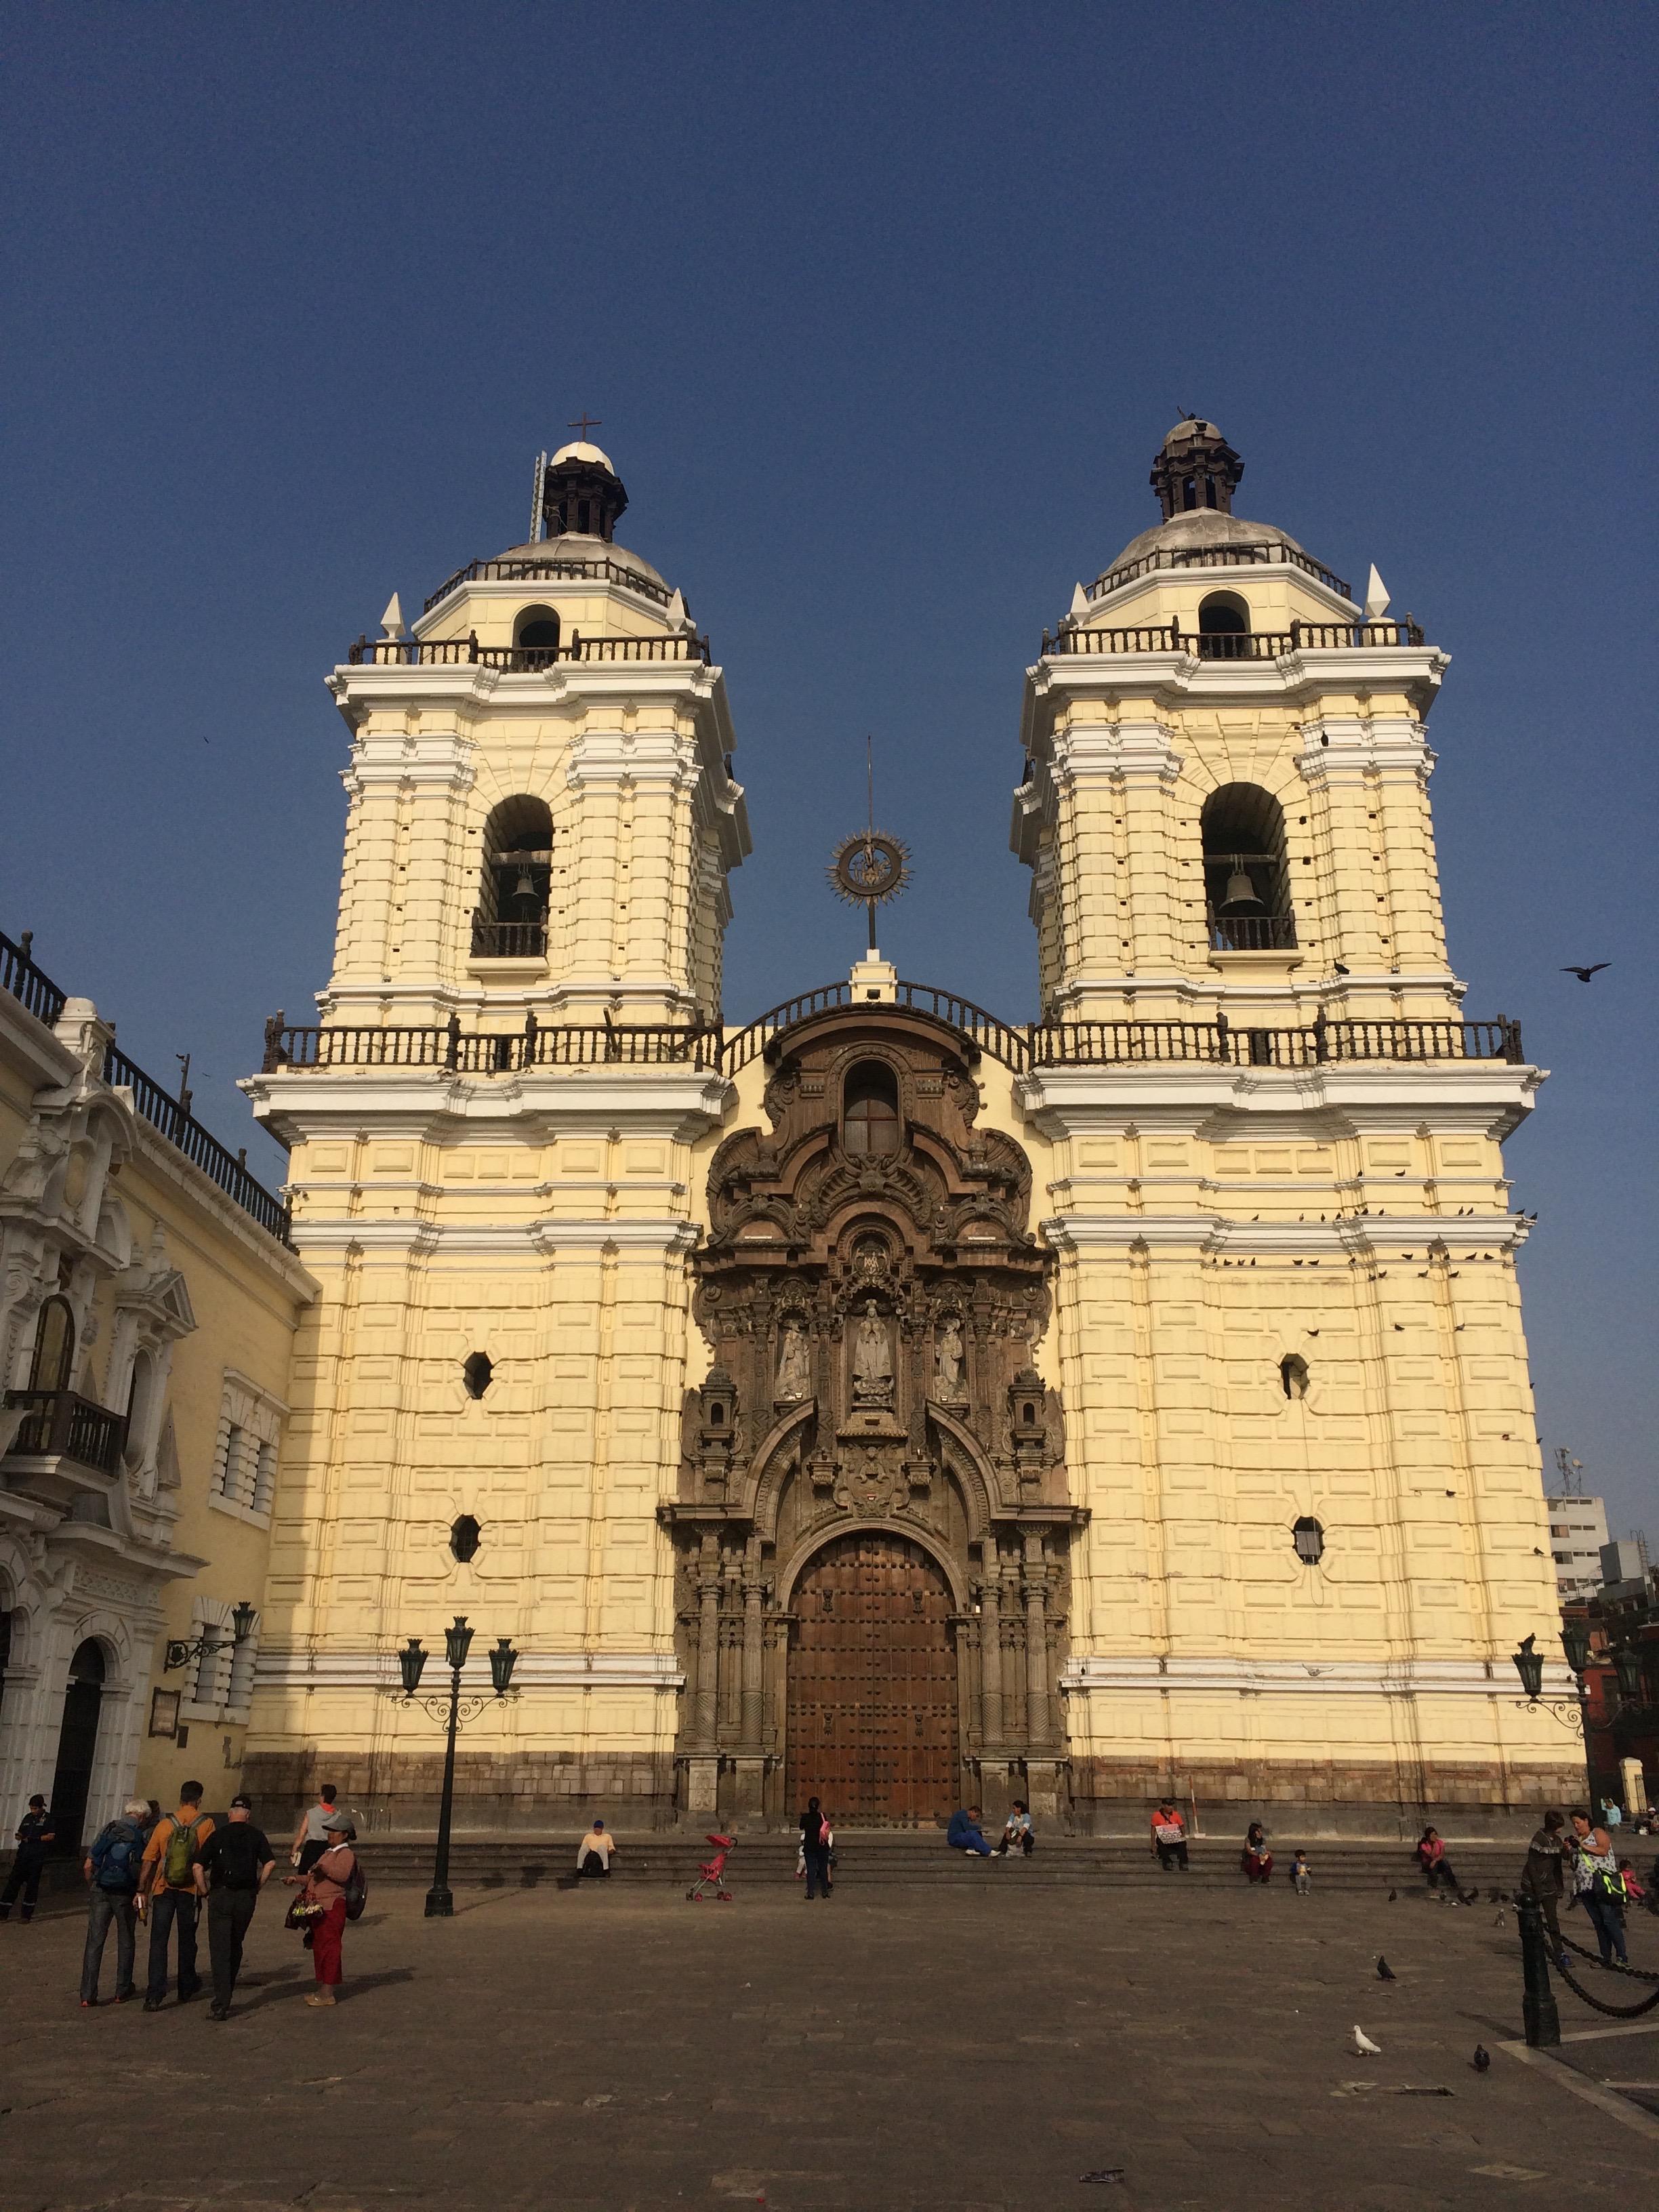 Basílica de San Francisco. It's a beautiful building, inside and out.